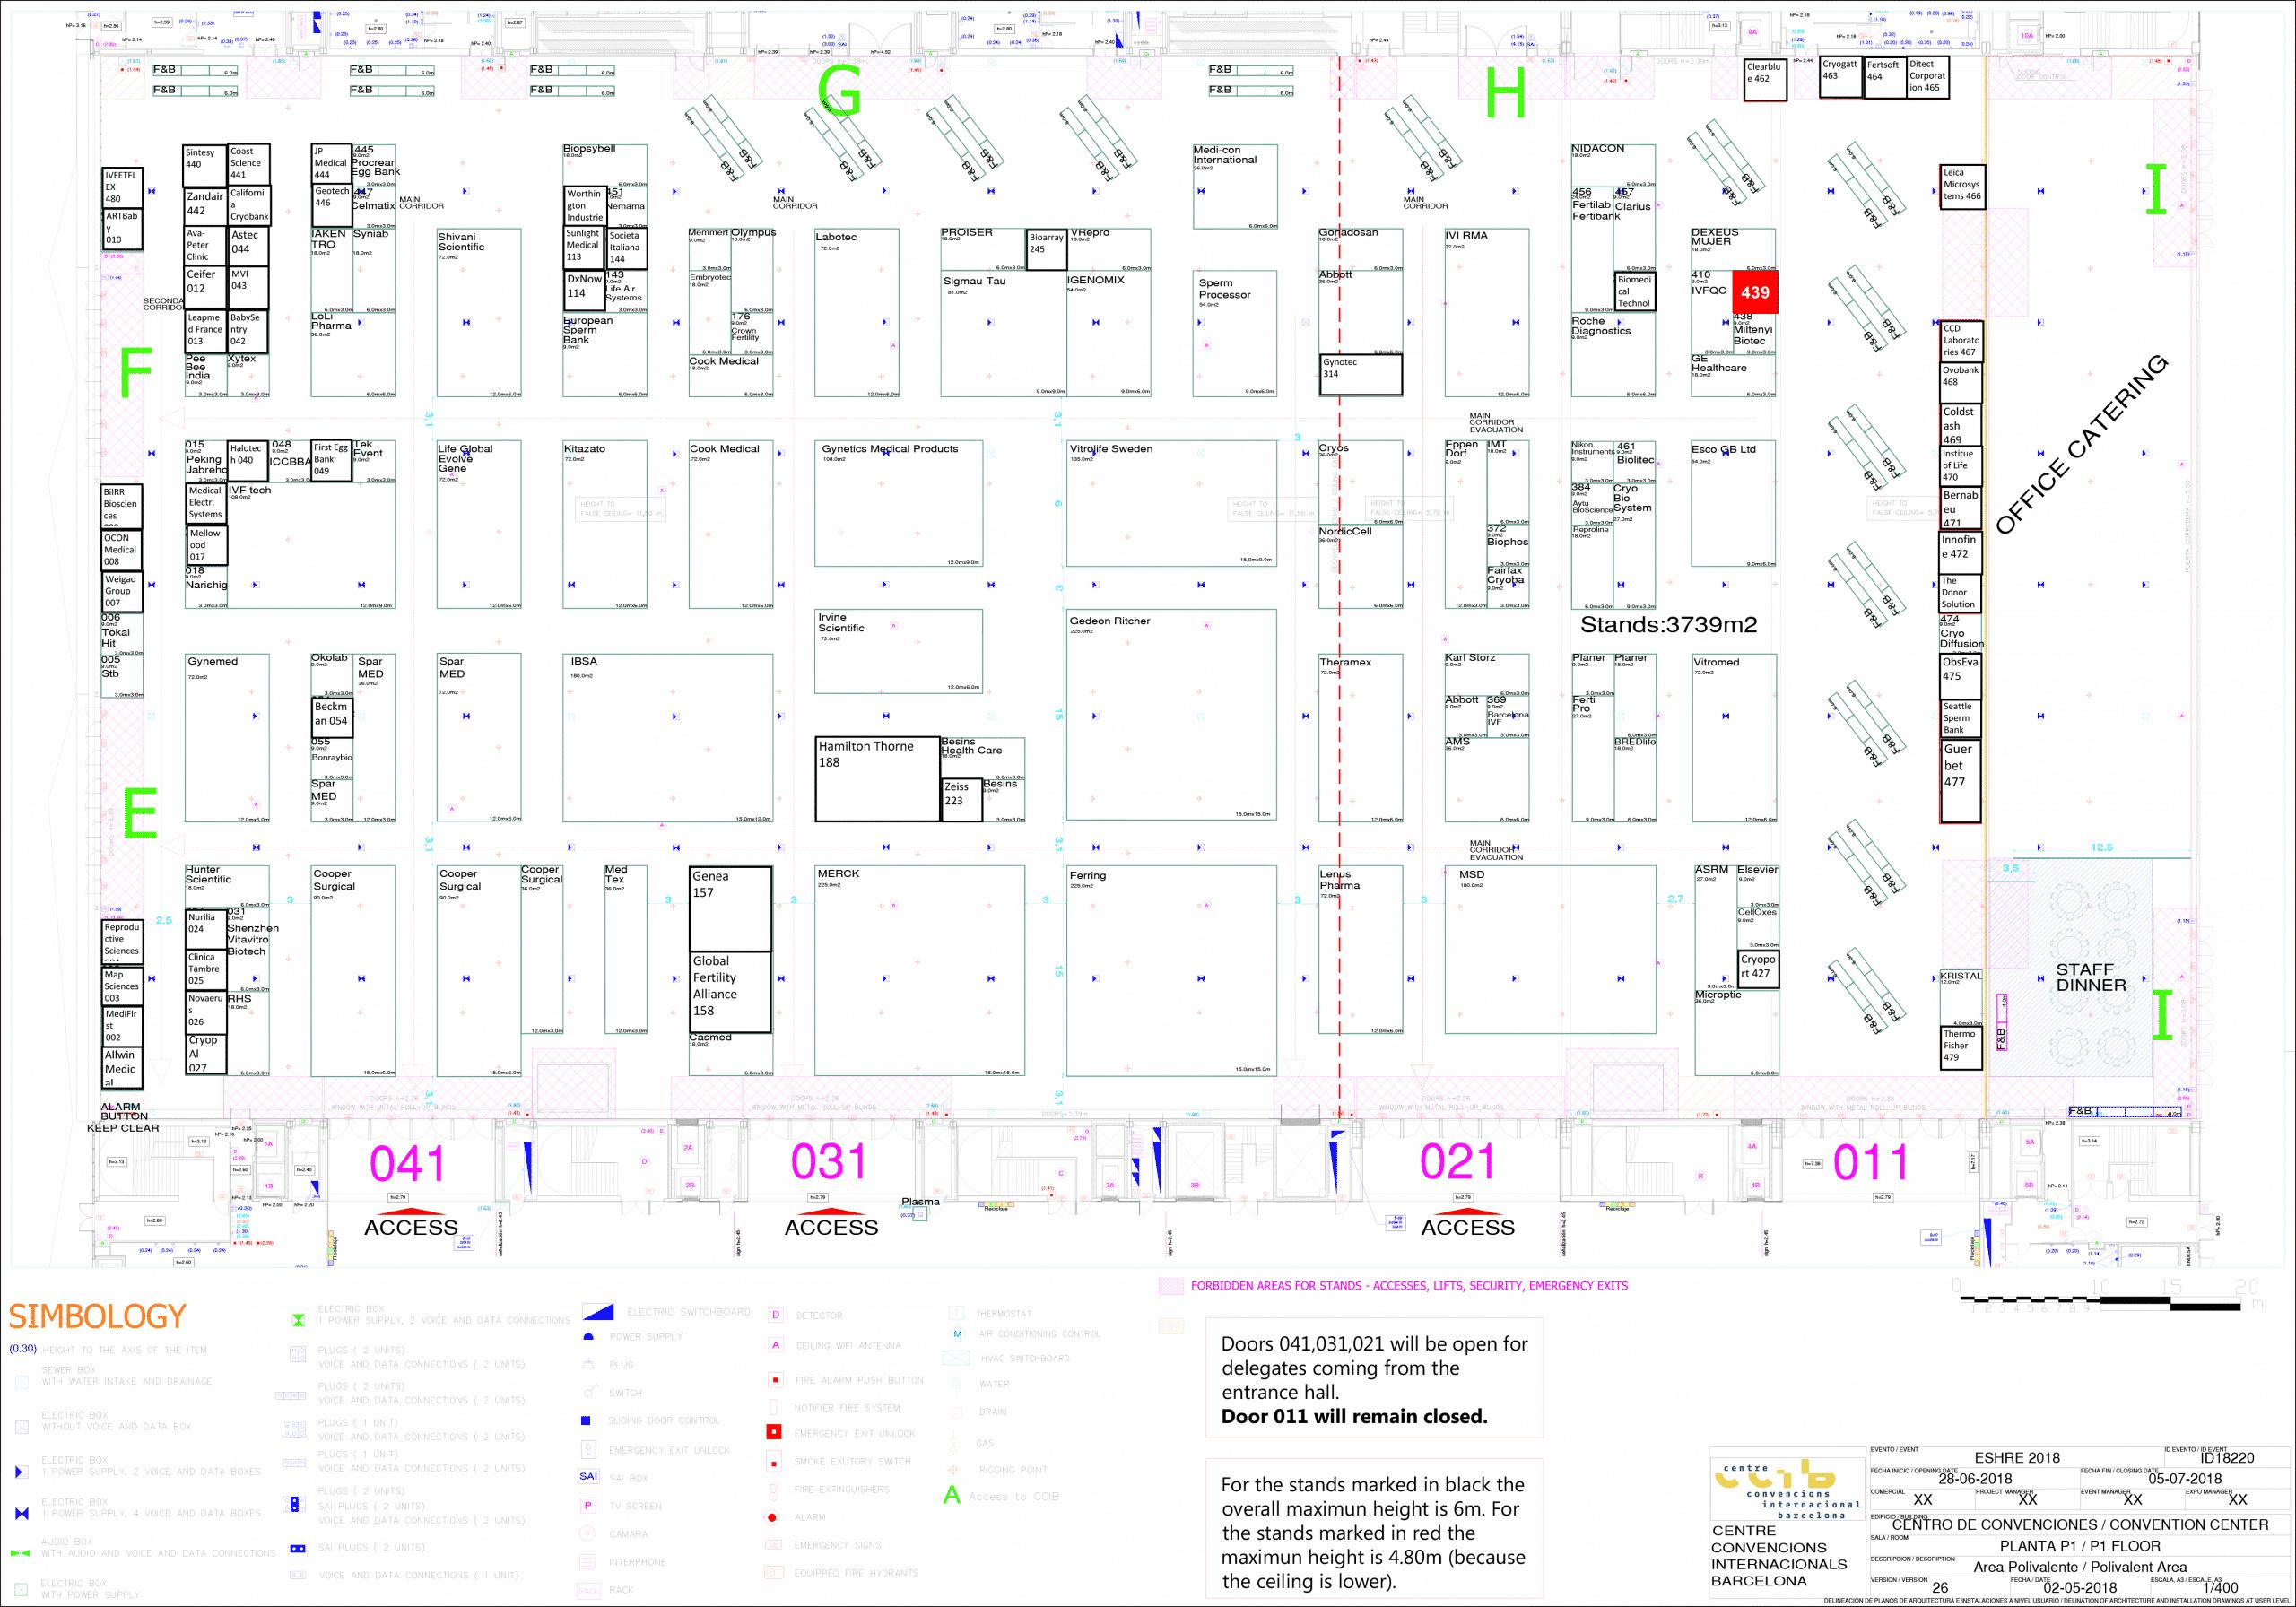 Exhibit floorplan